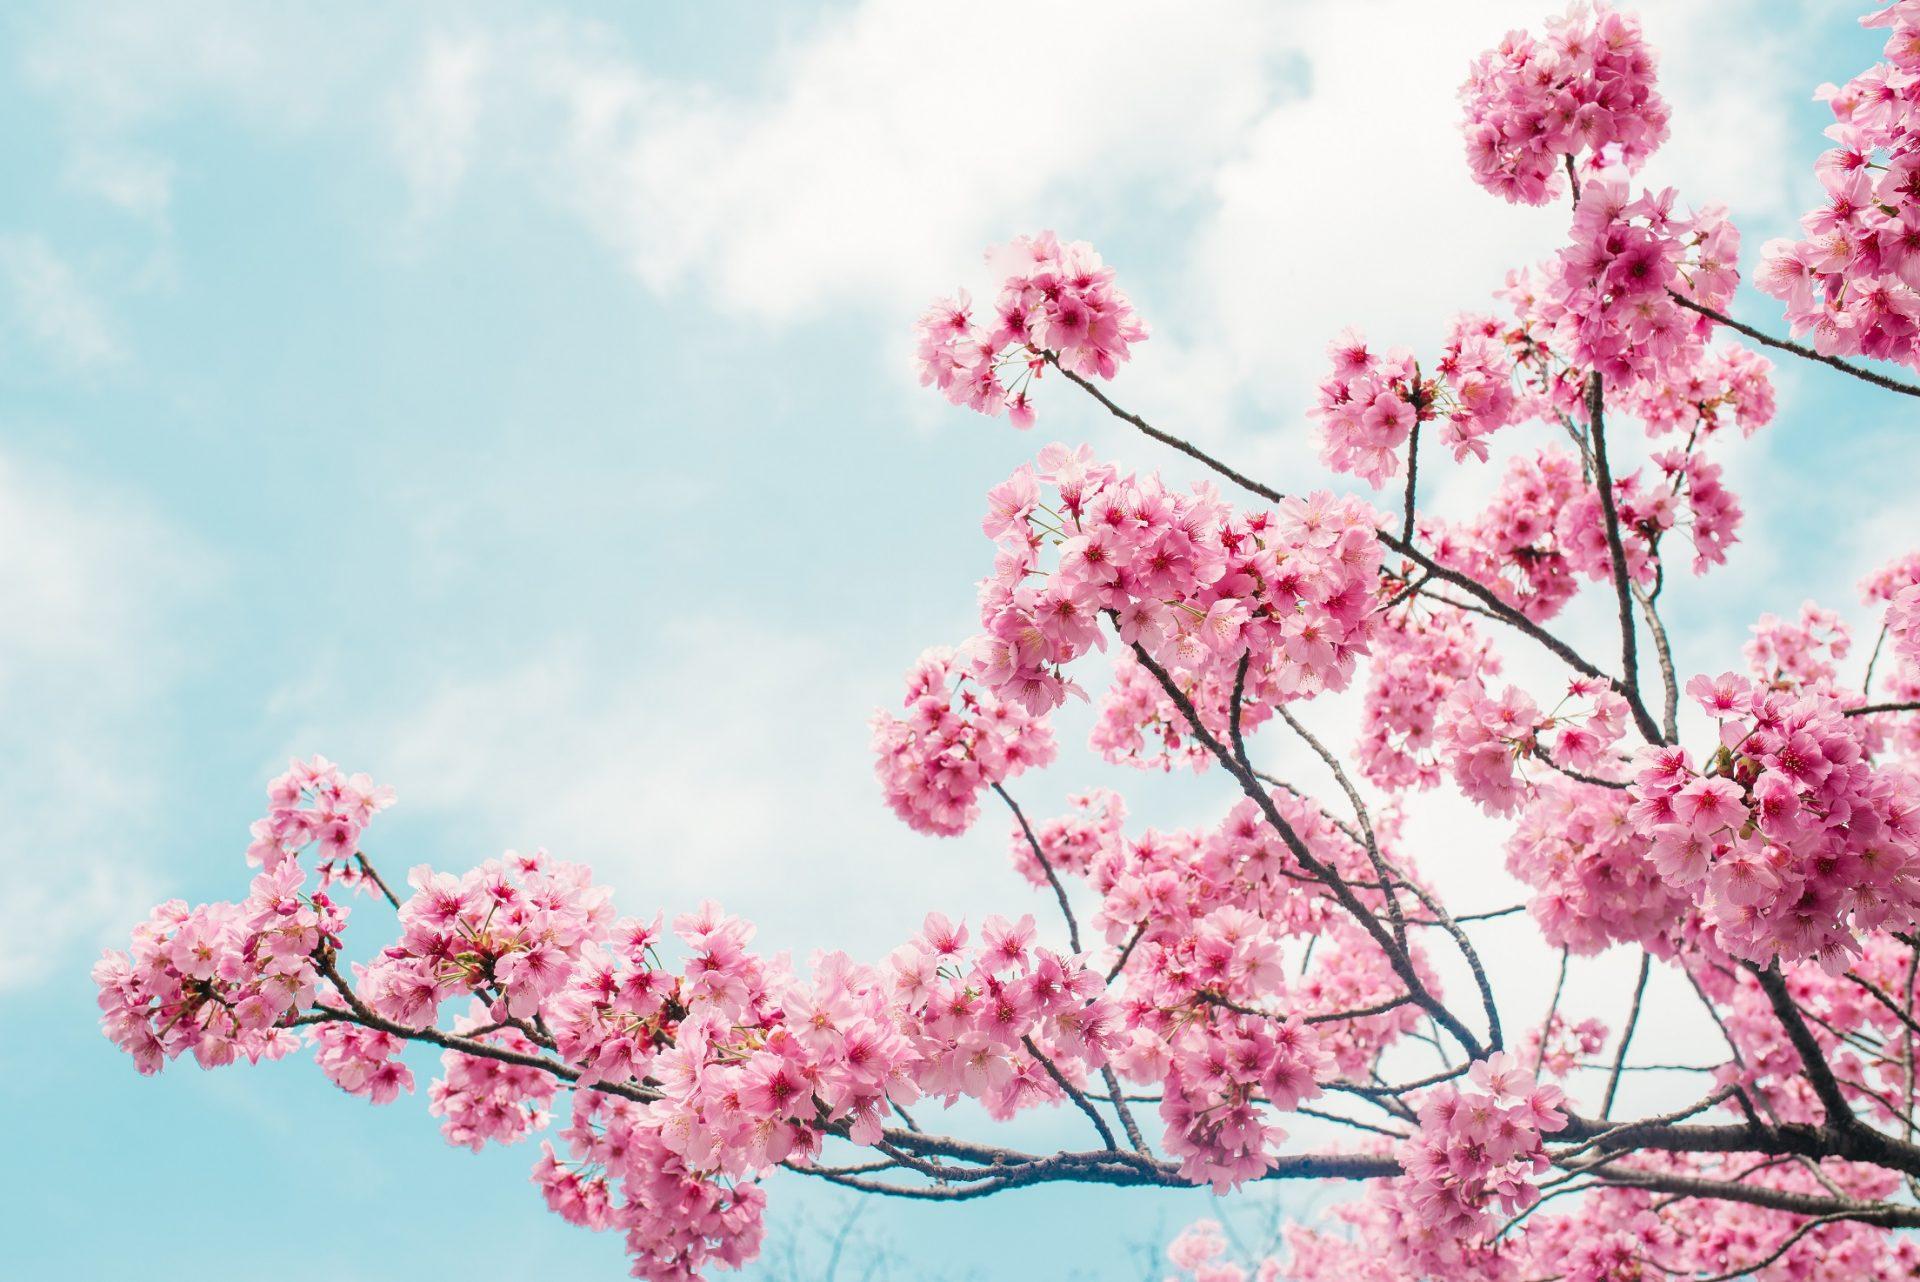 arbres à fleurs sakura